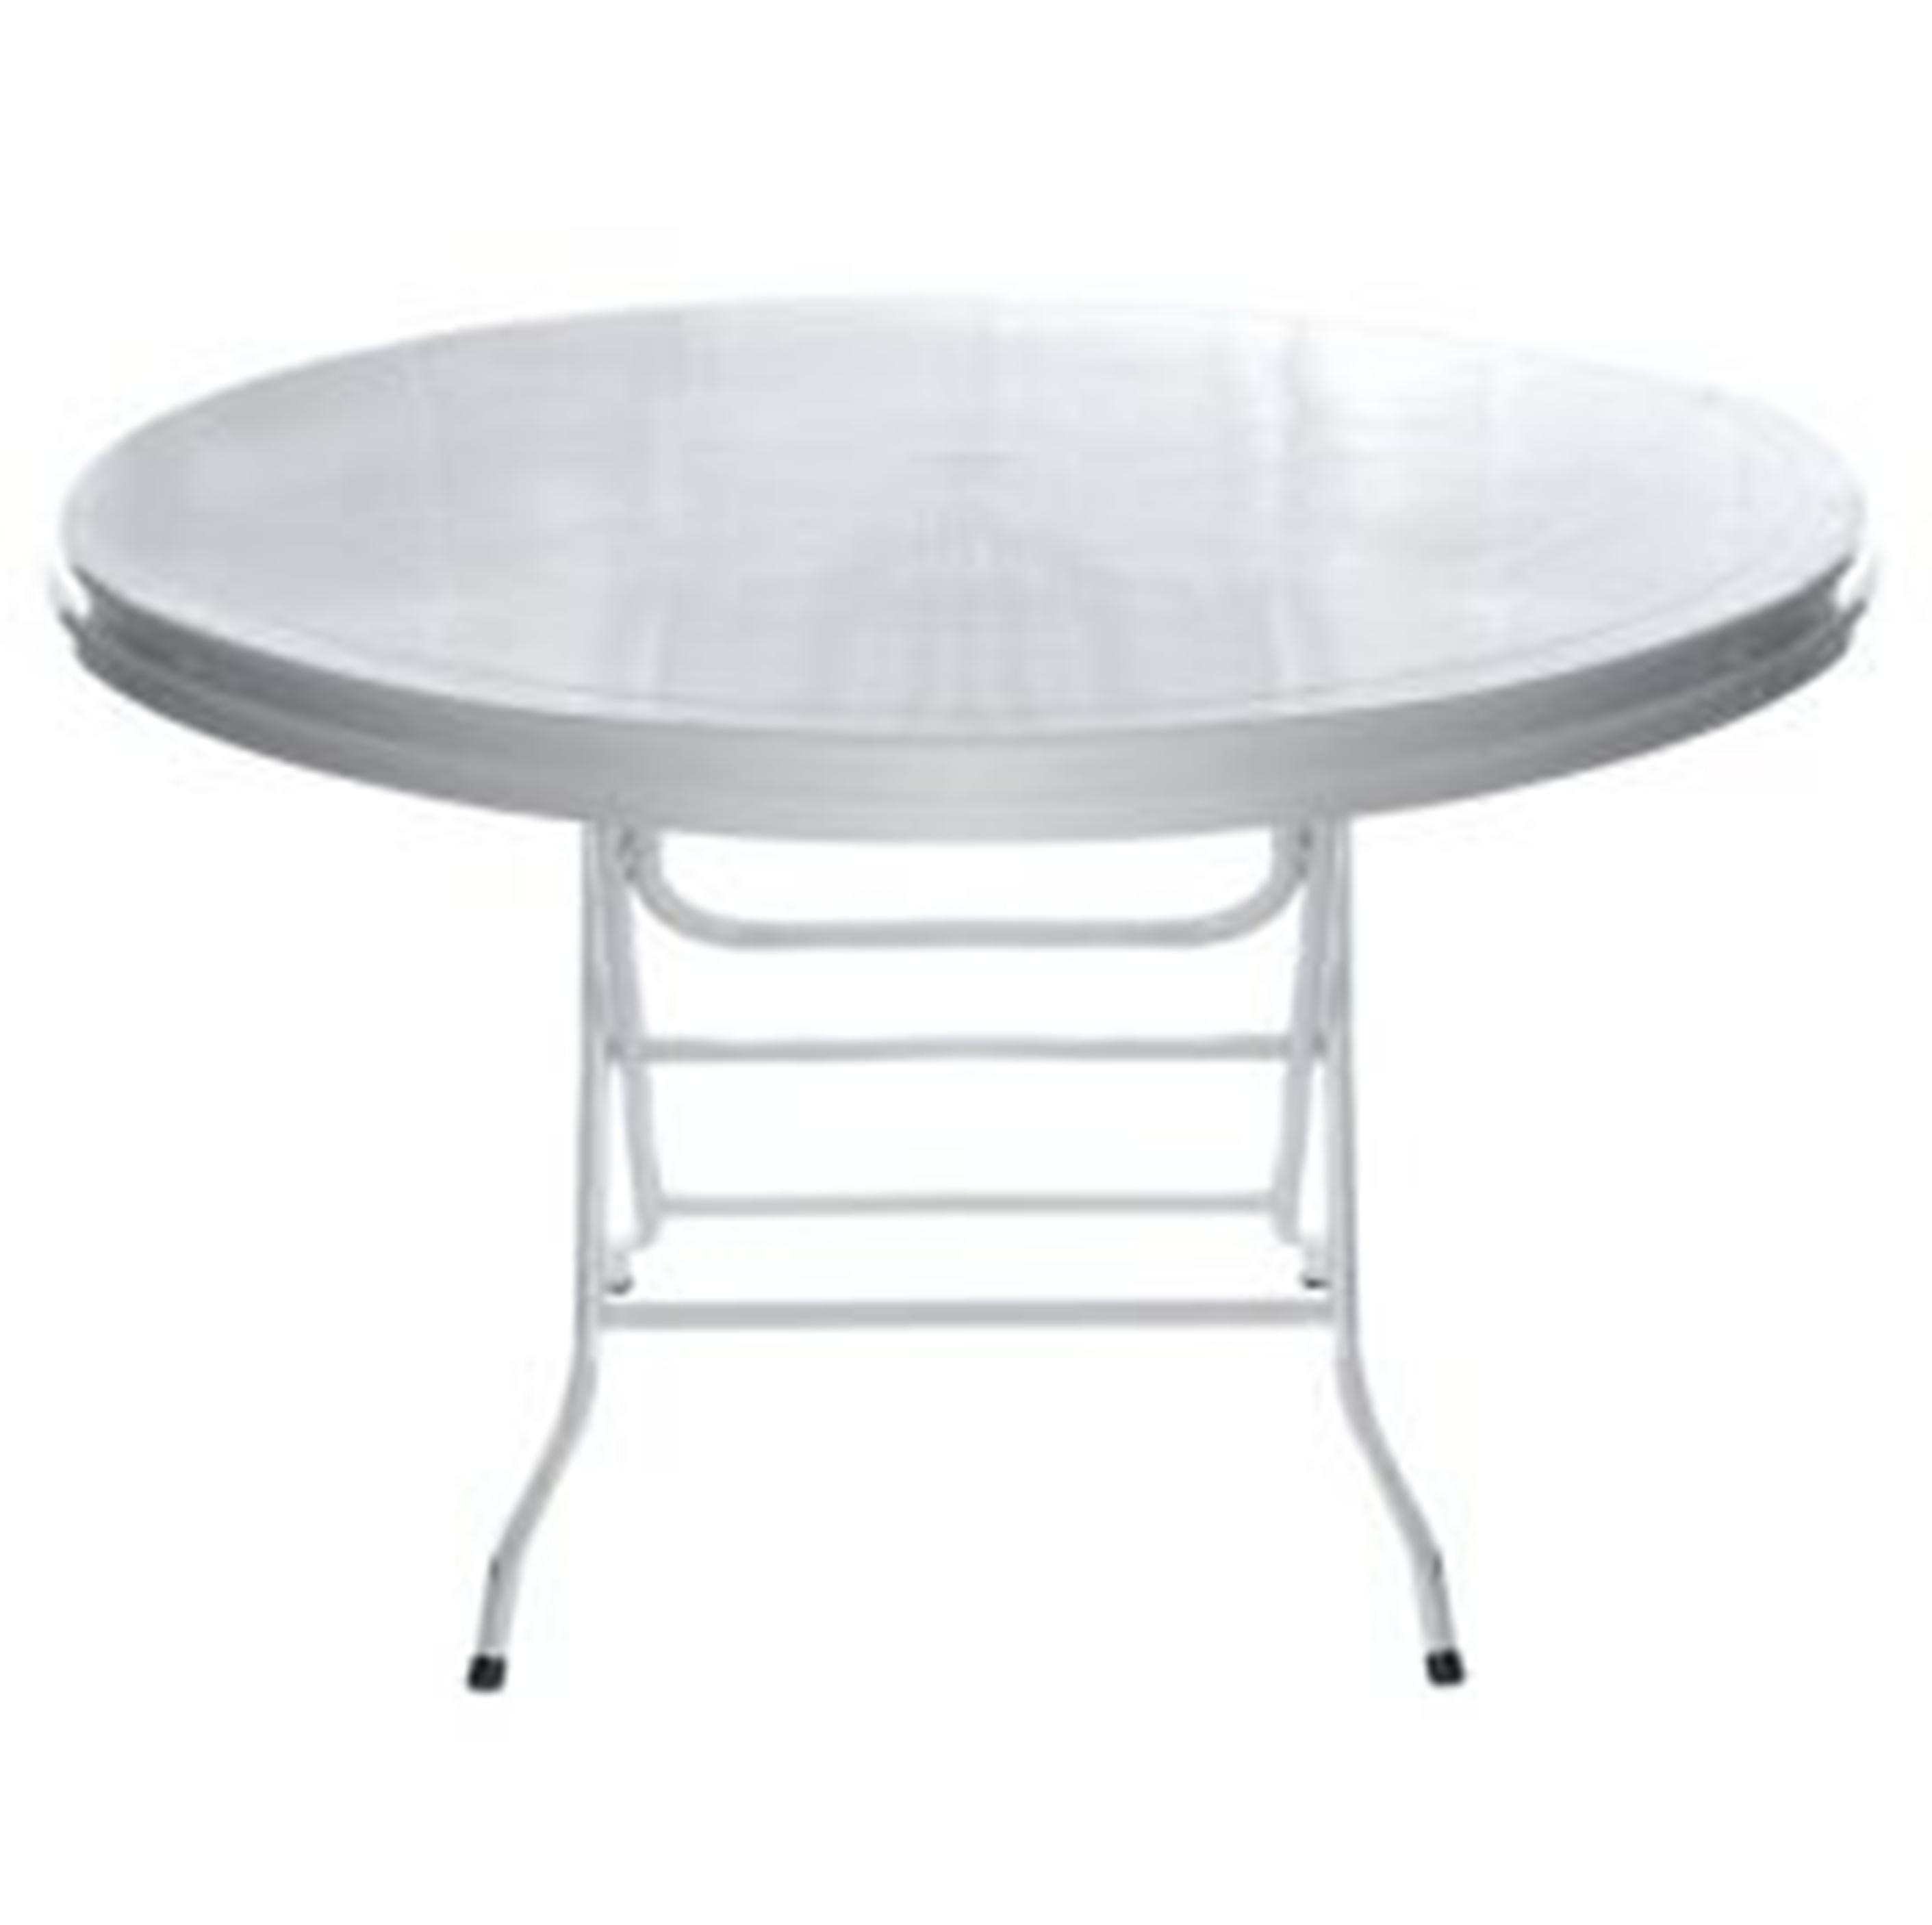 1.2m Round Trestle Table